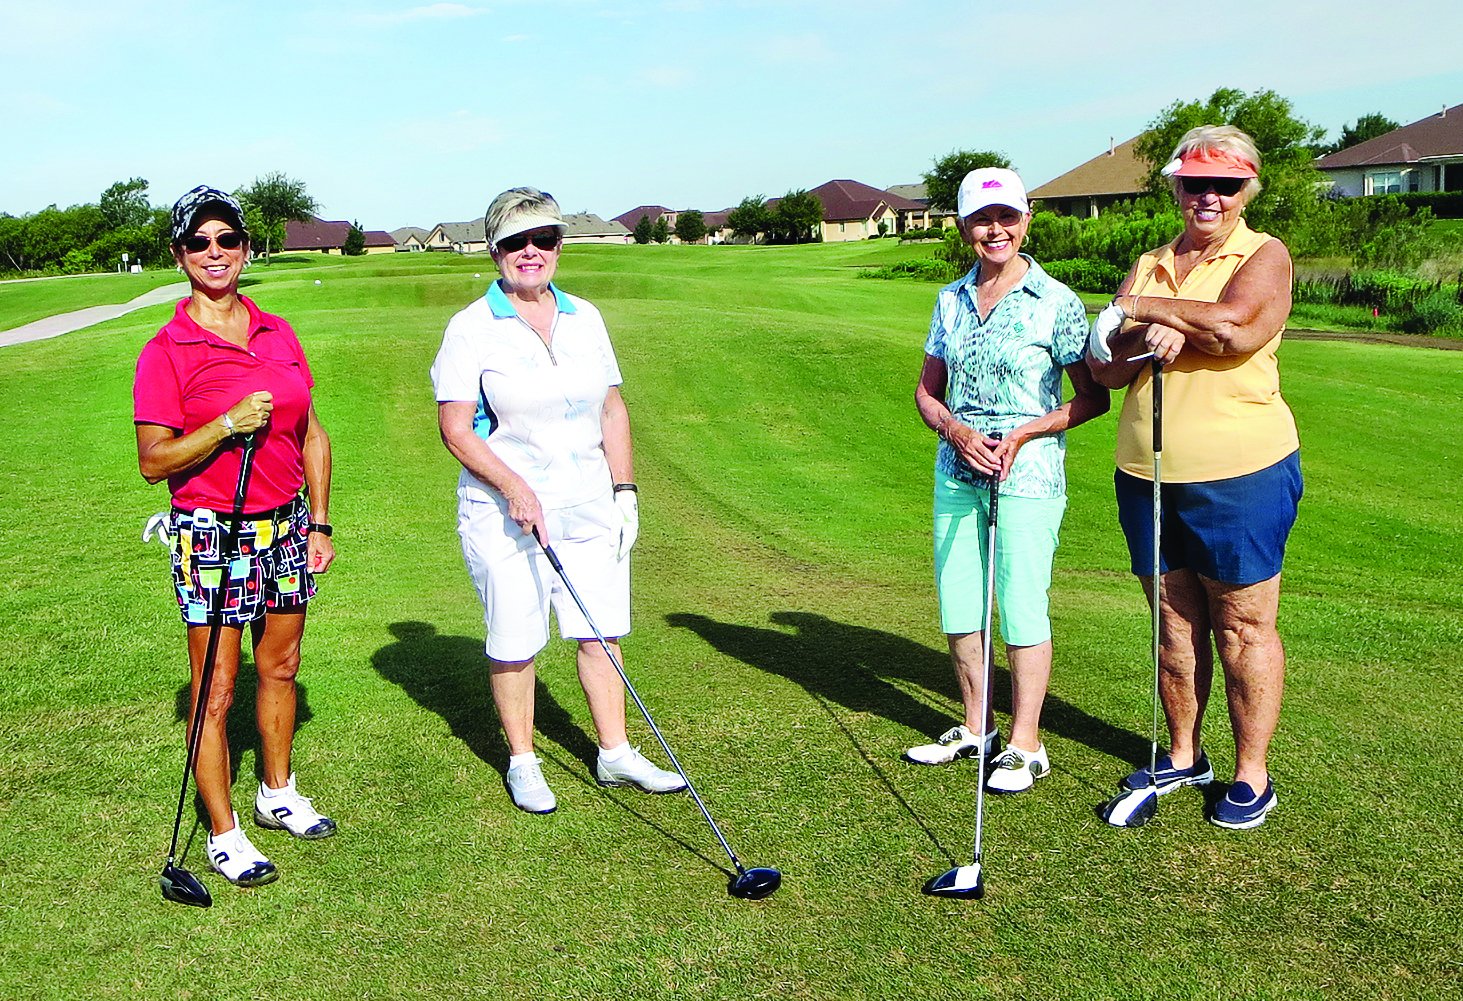 Left to right: Ana Corey, Maureen Lehrer, Linda Knightly, and Pam Kanawyer